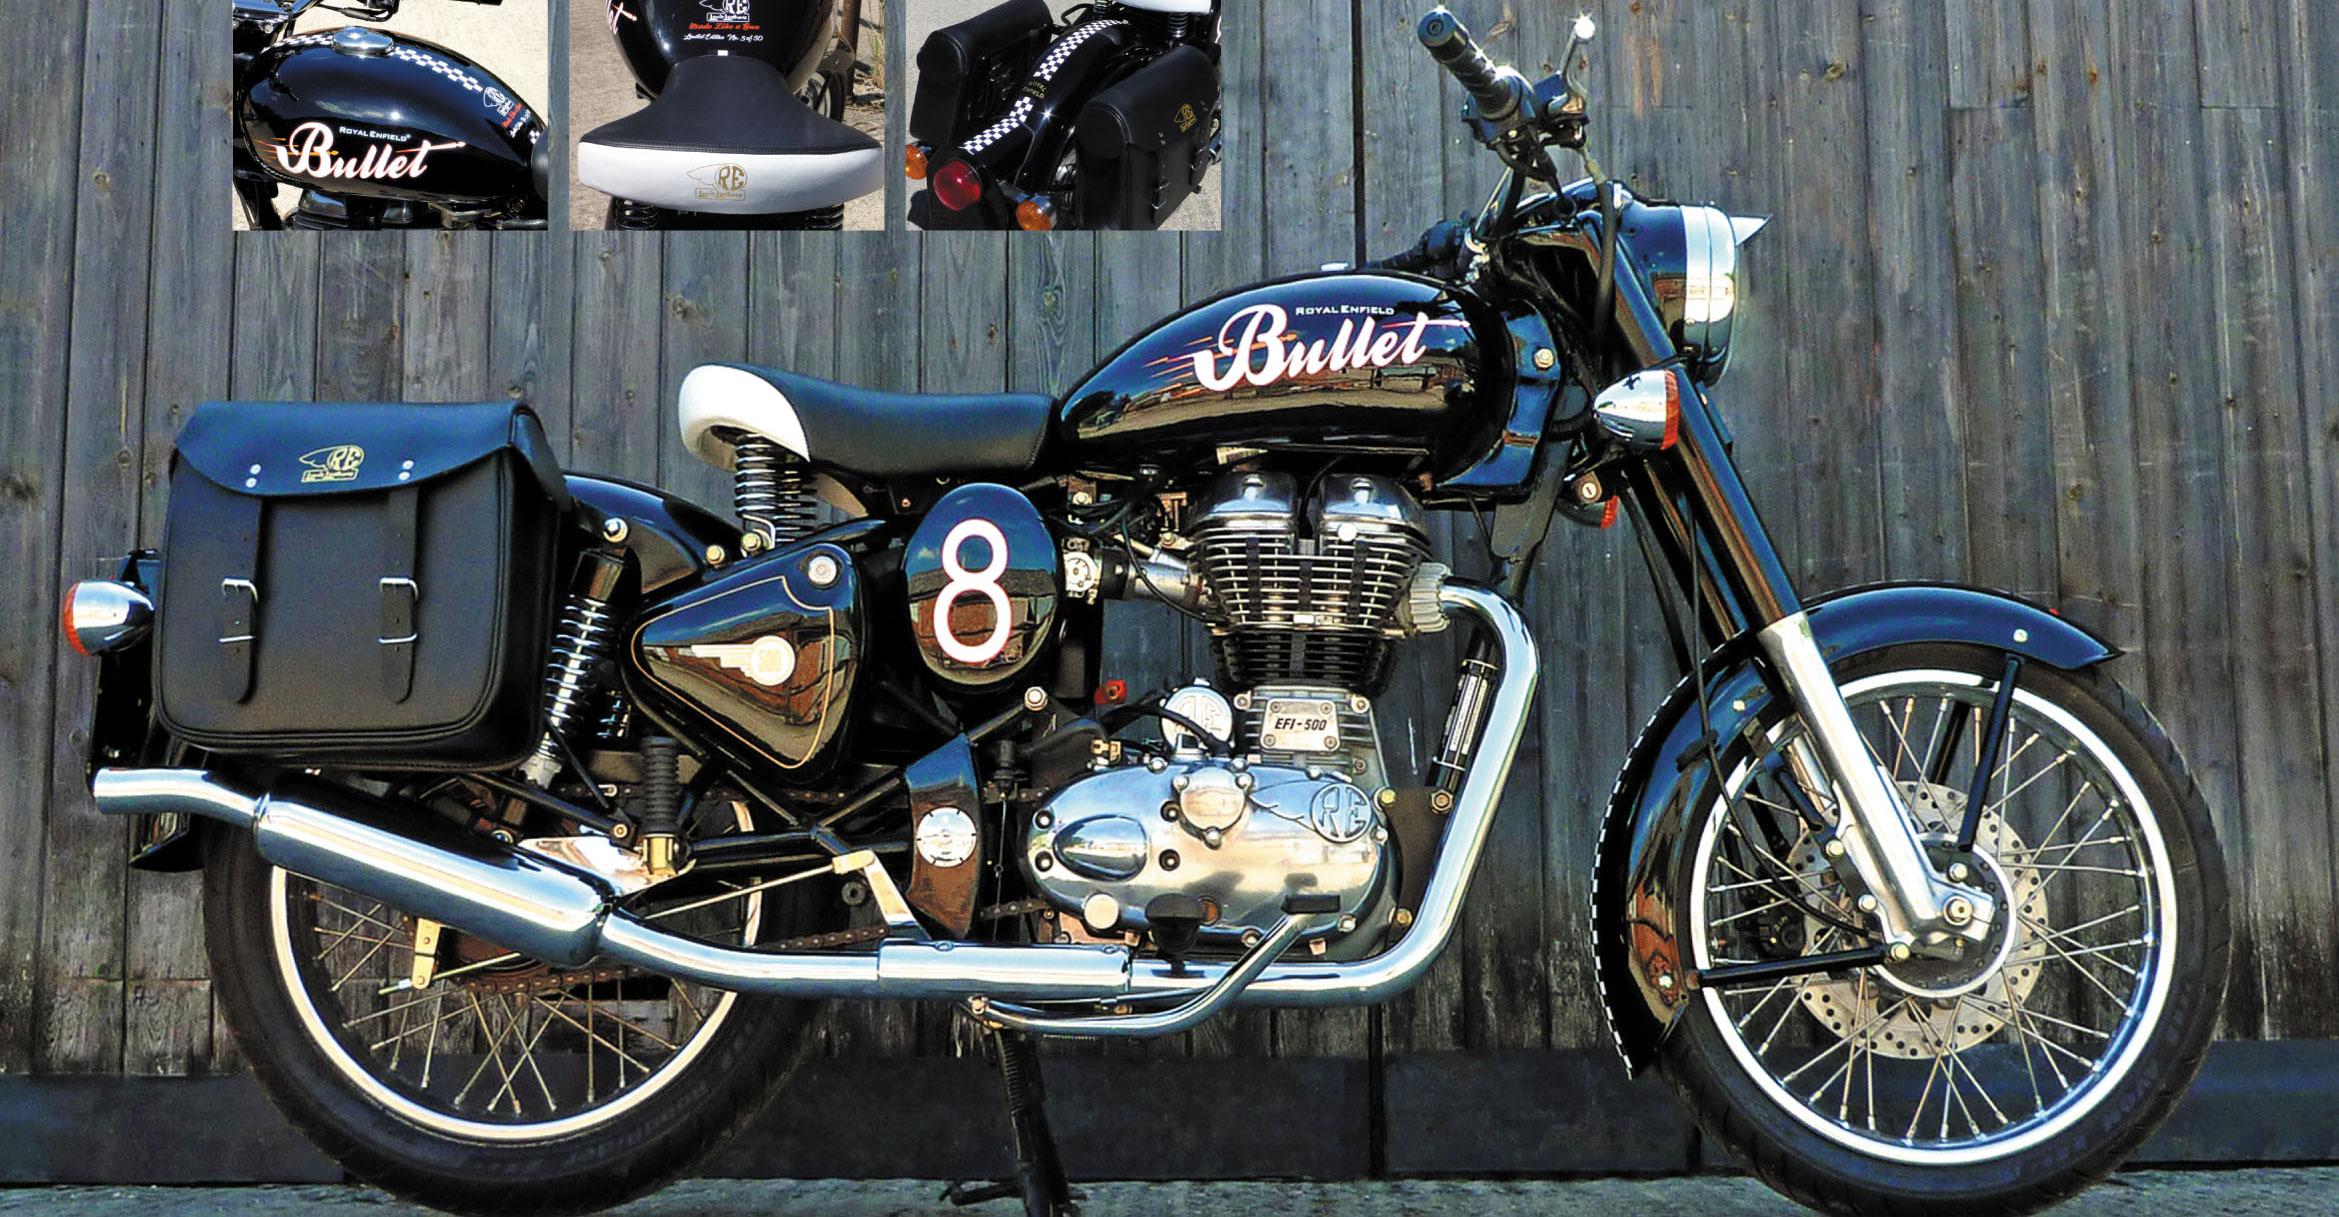 Royal Enfield Bullet 500 Classic